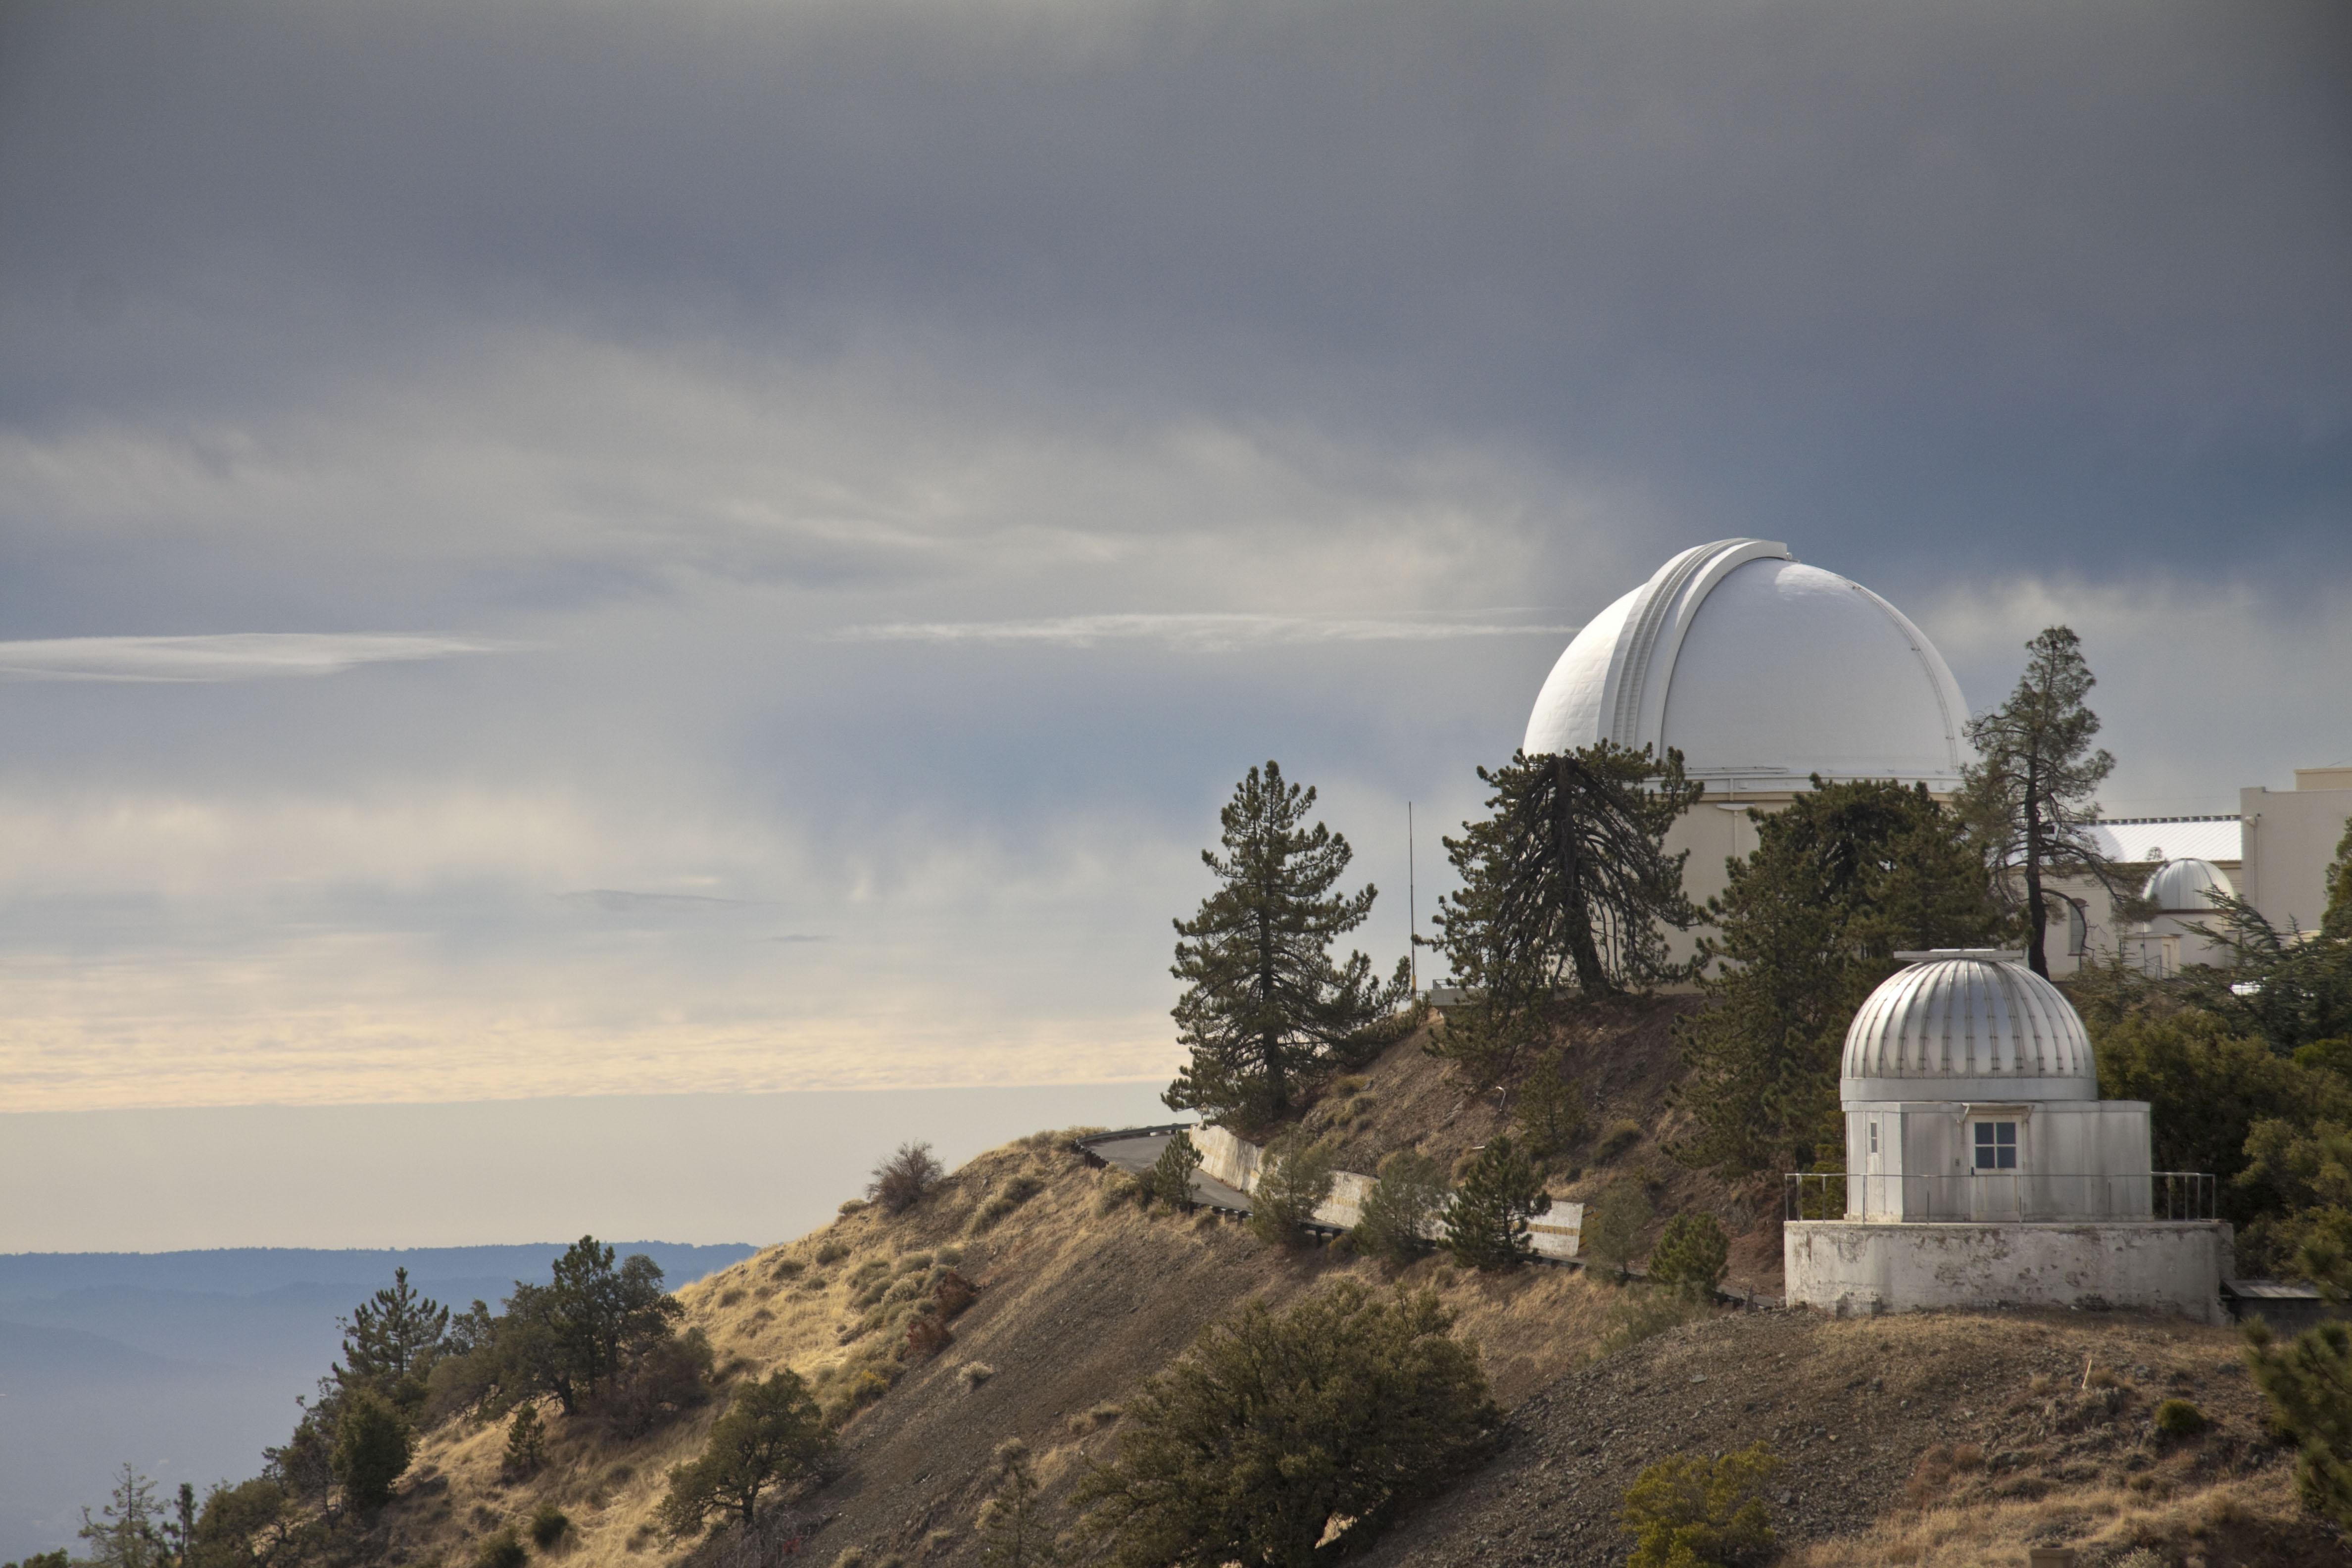 Lick observatory address